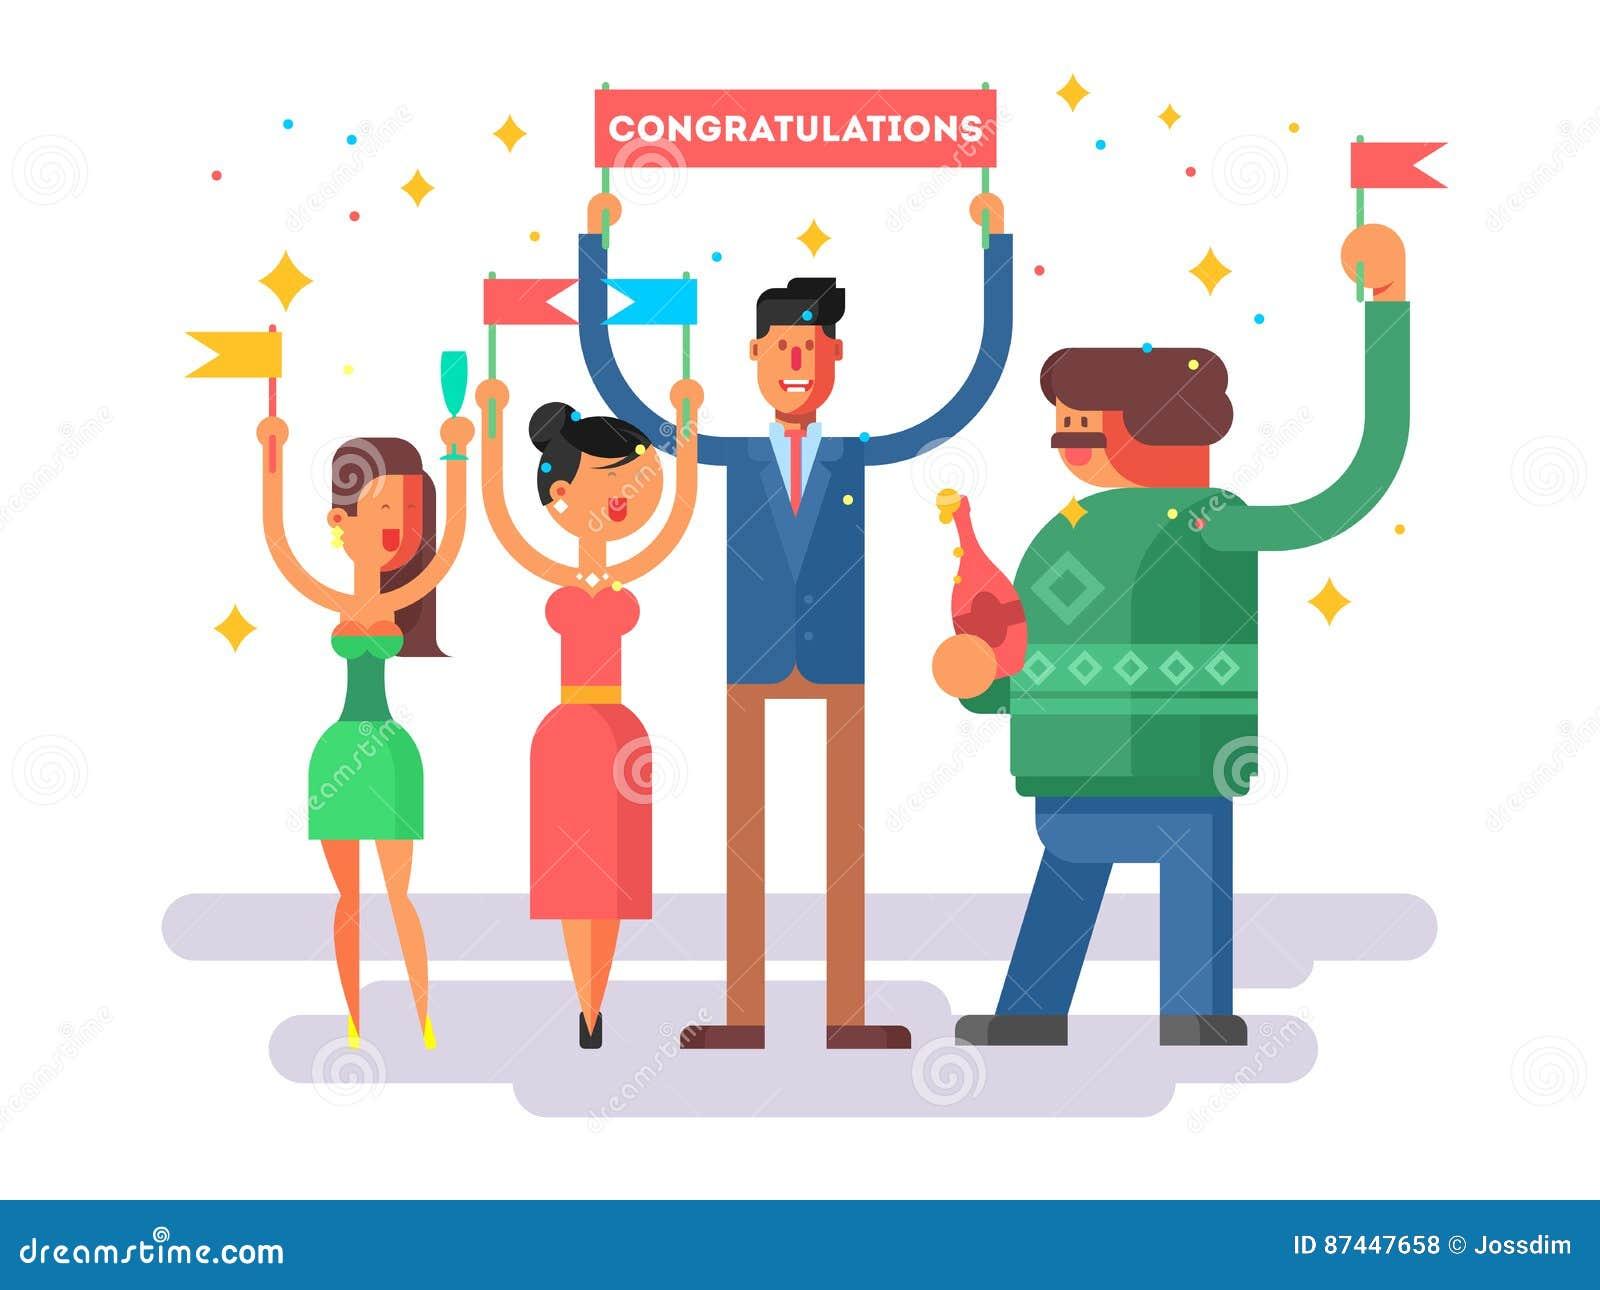 How to congratulate a woman